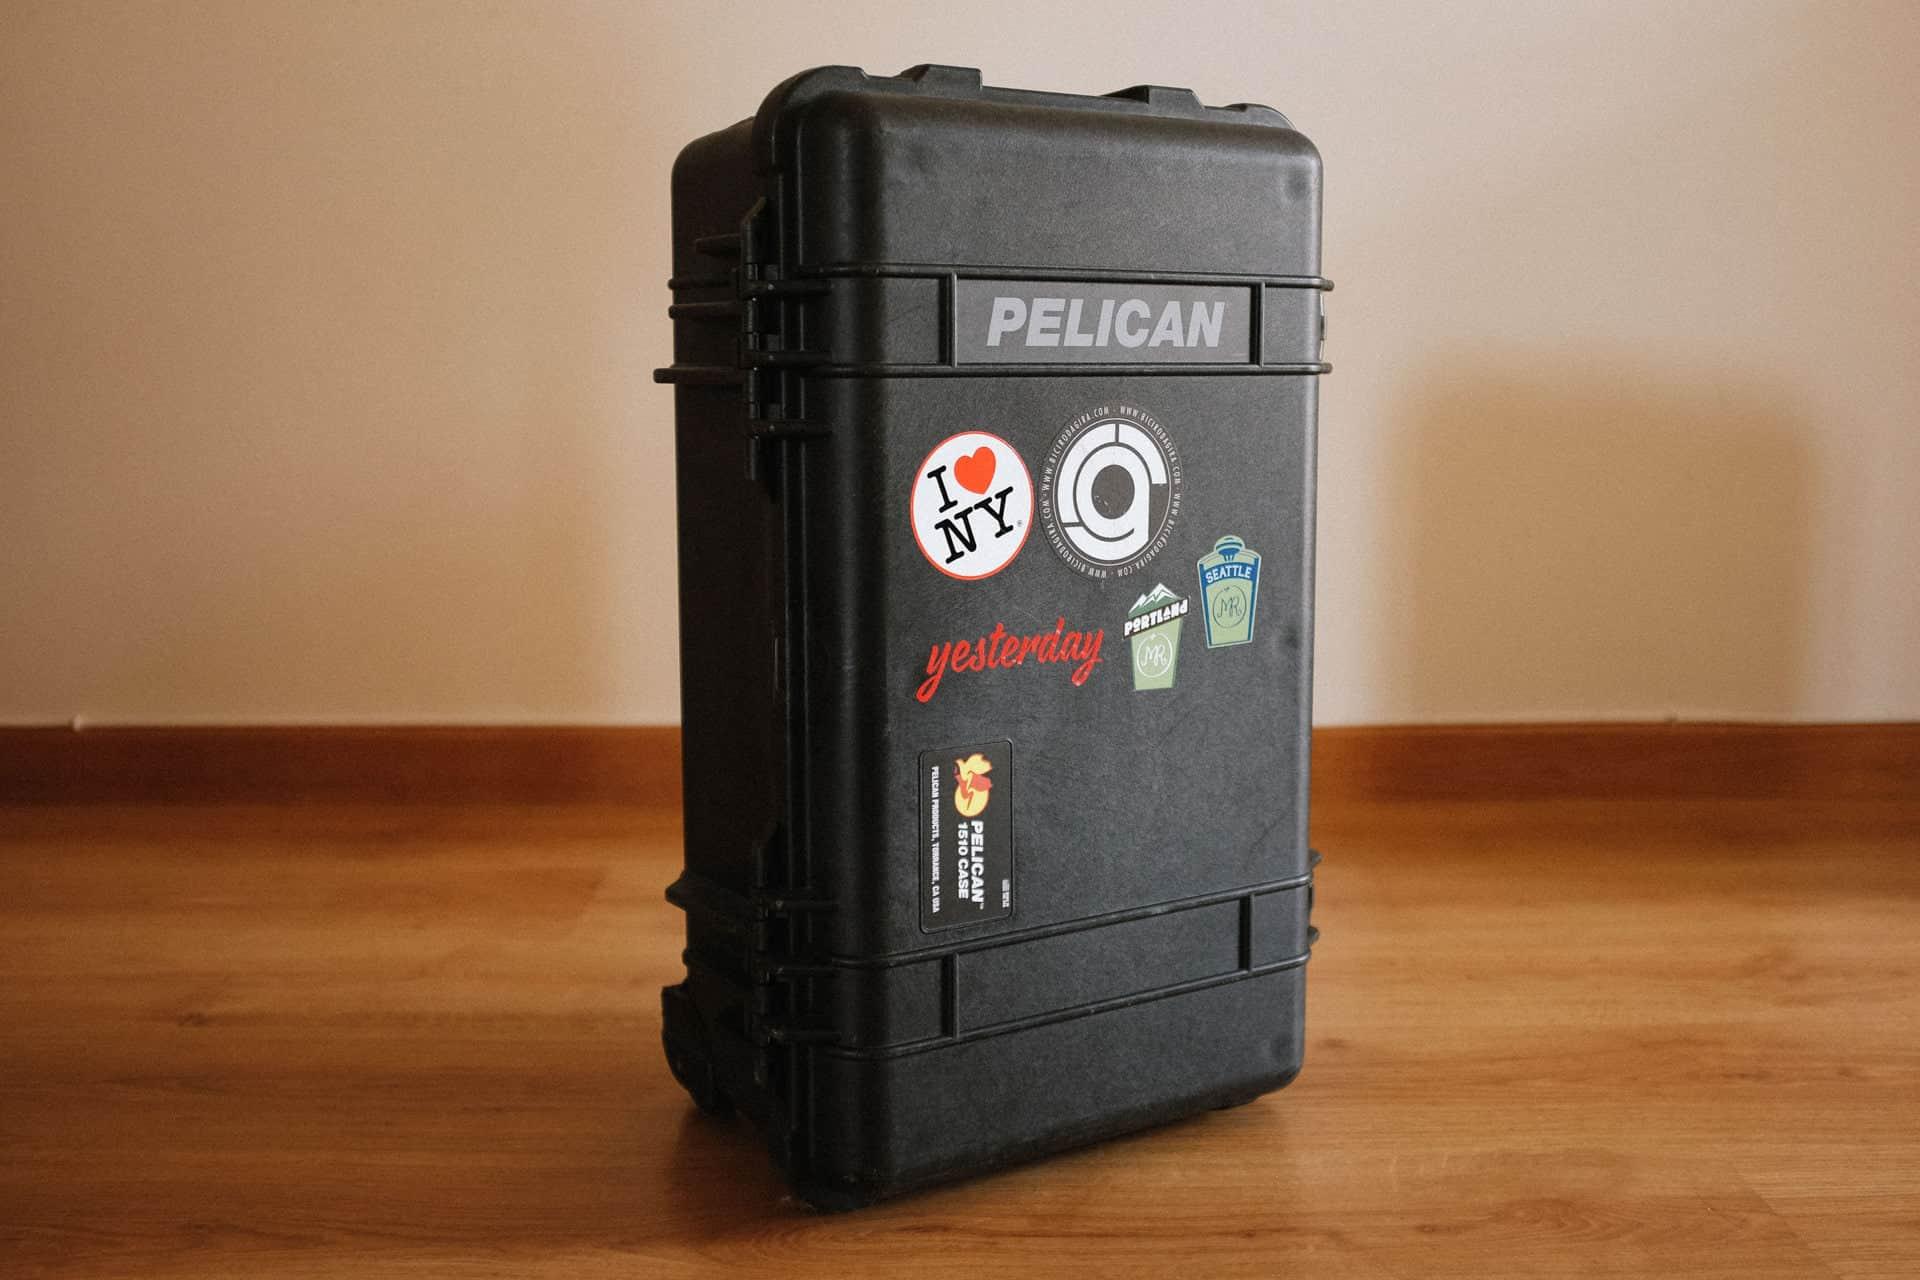 Pelican 1510 hard case